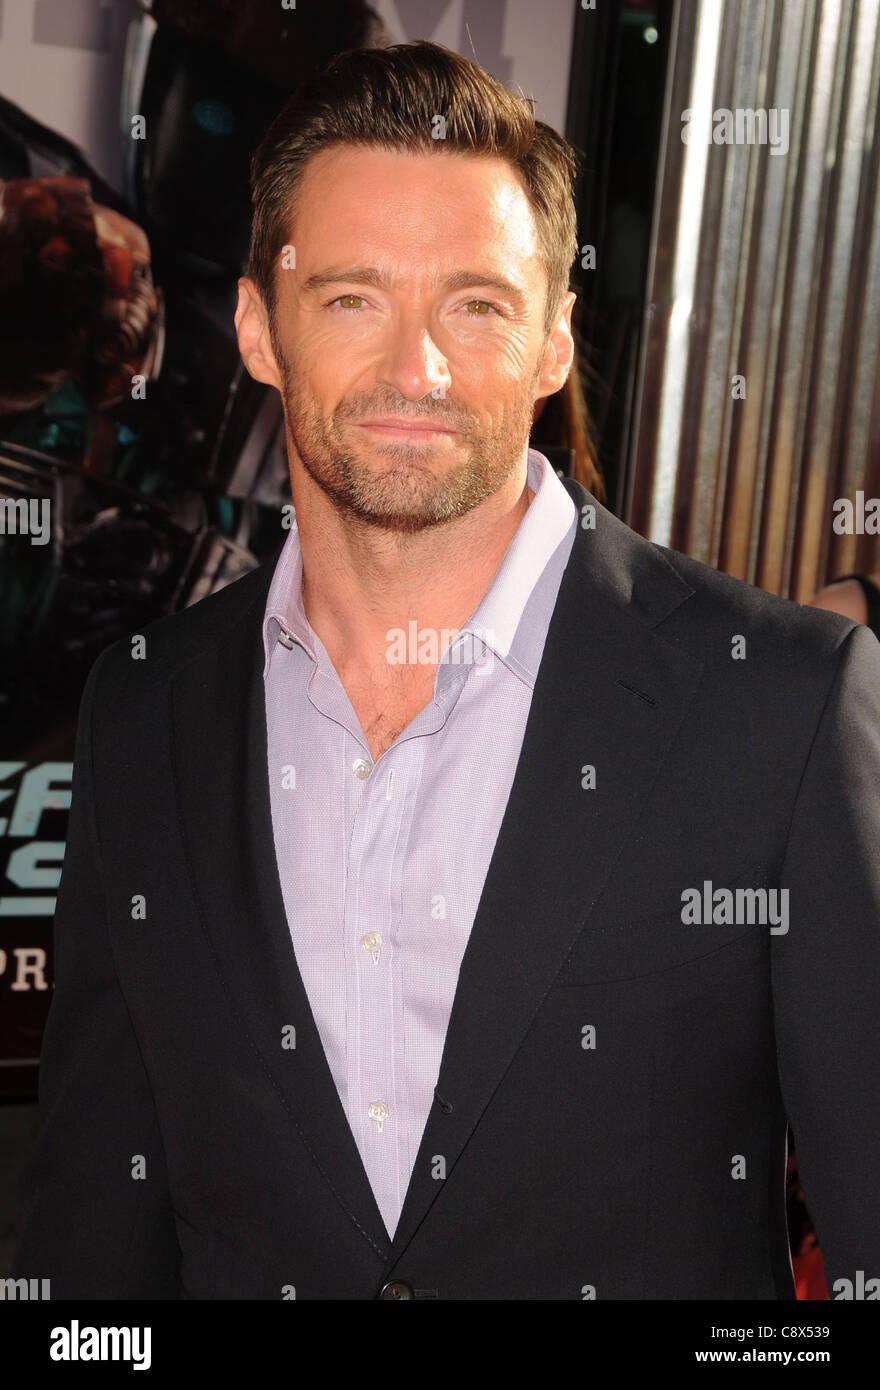 Hugh Jackman arrivals REAL STEEL Premiere Gibson Amphitheatre Universal Studios Hollywood Los Angeles CA October - Stock Image